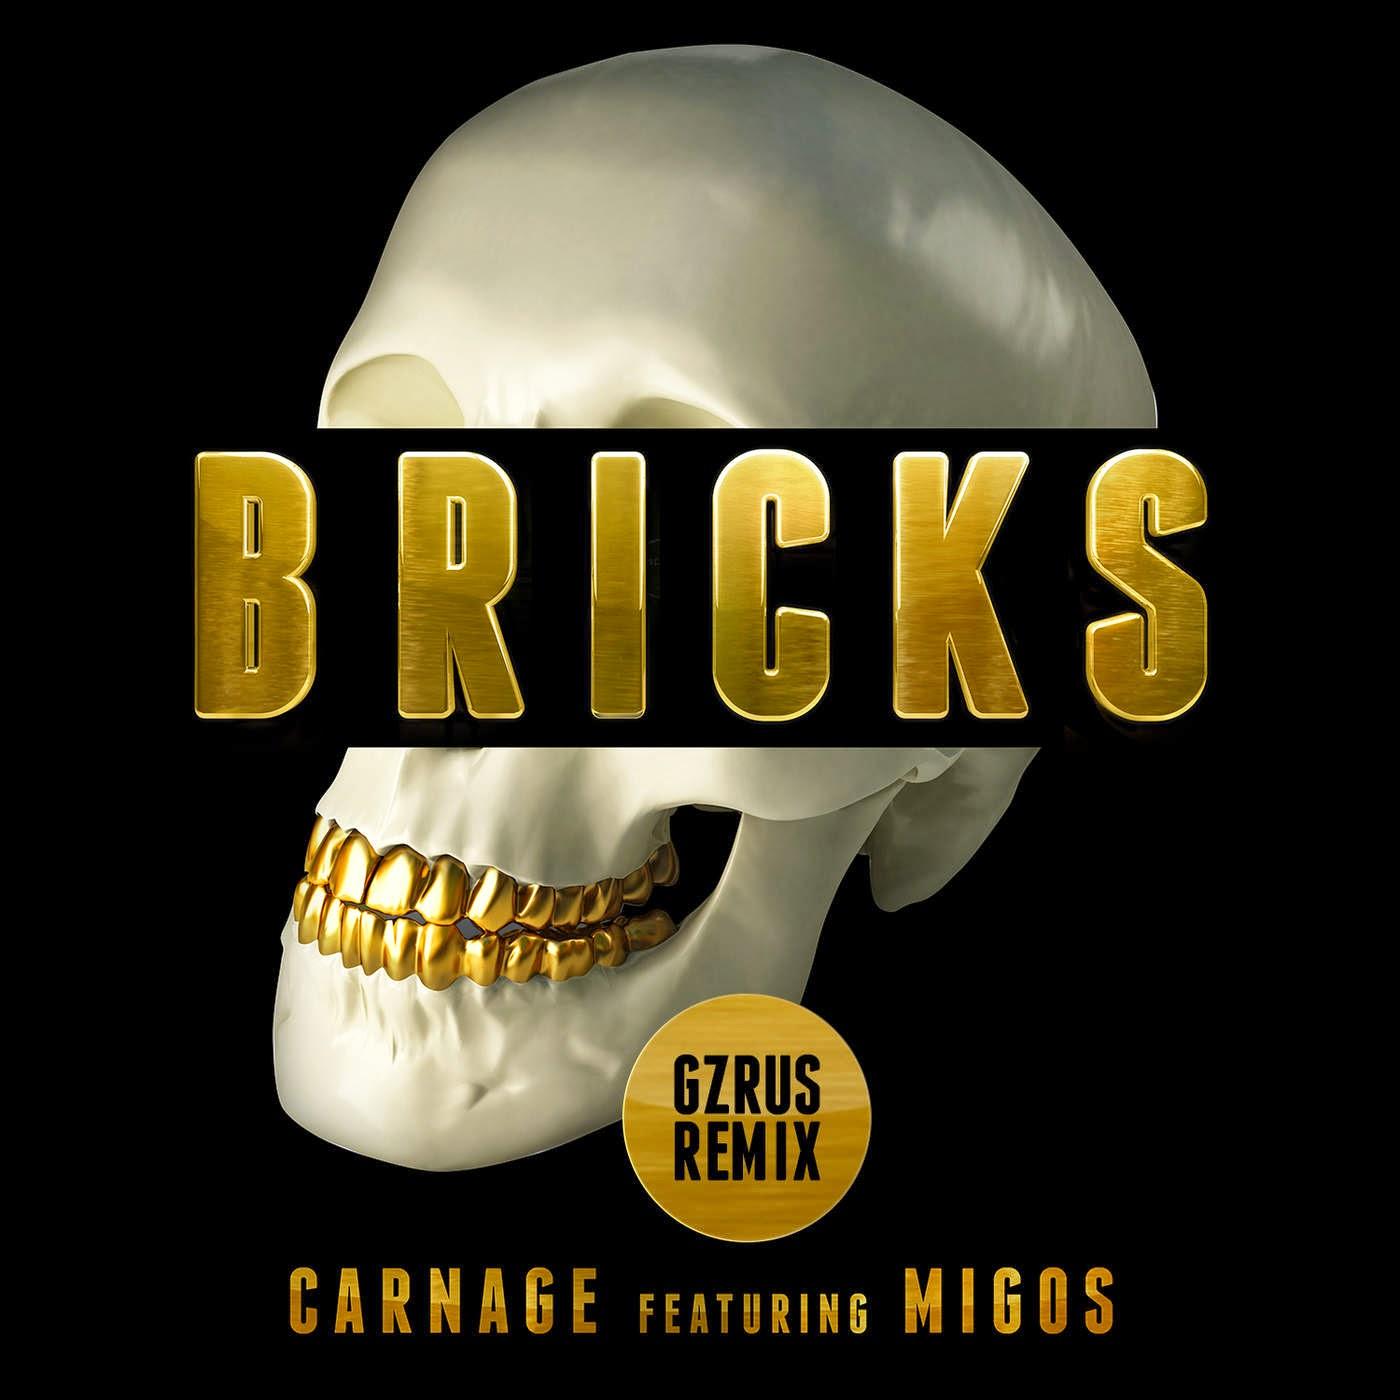 Carnage - Bricks (feat. Migos) [GZRUS Remix] - Single Cover